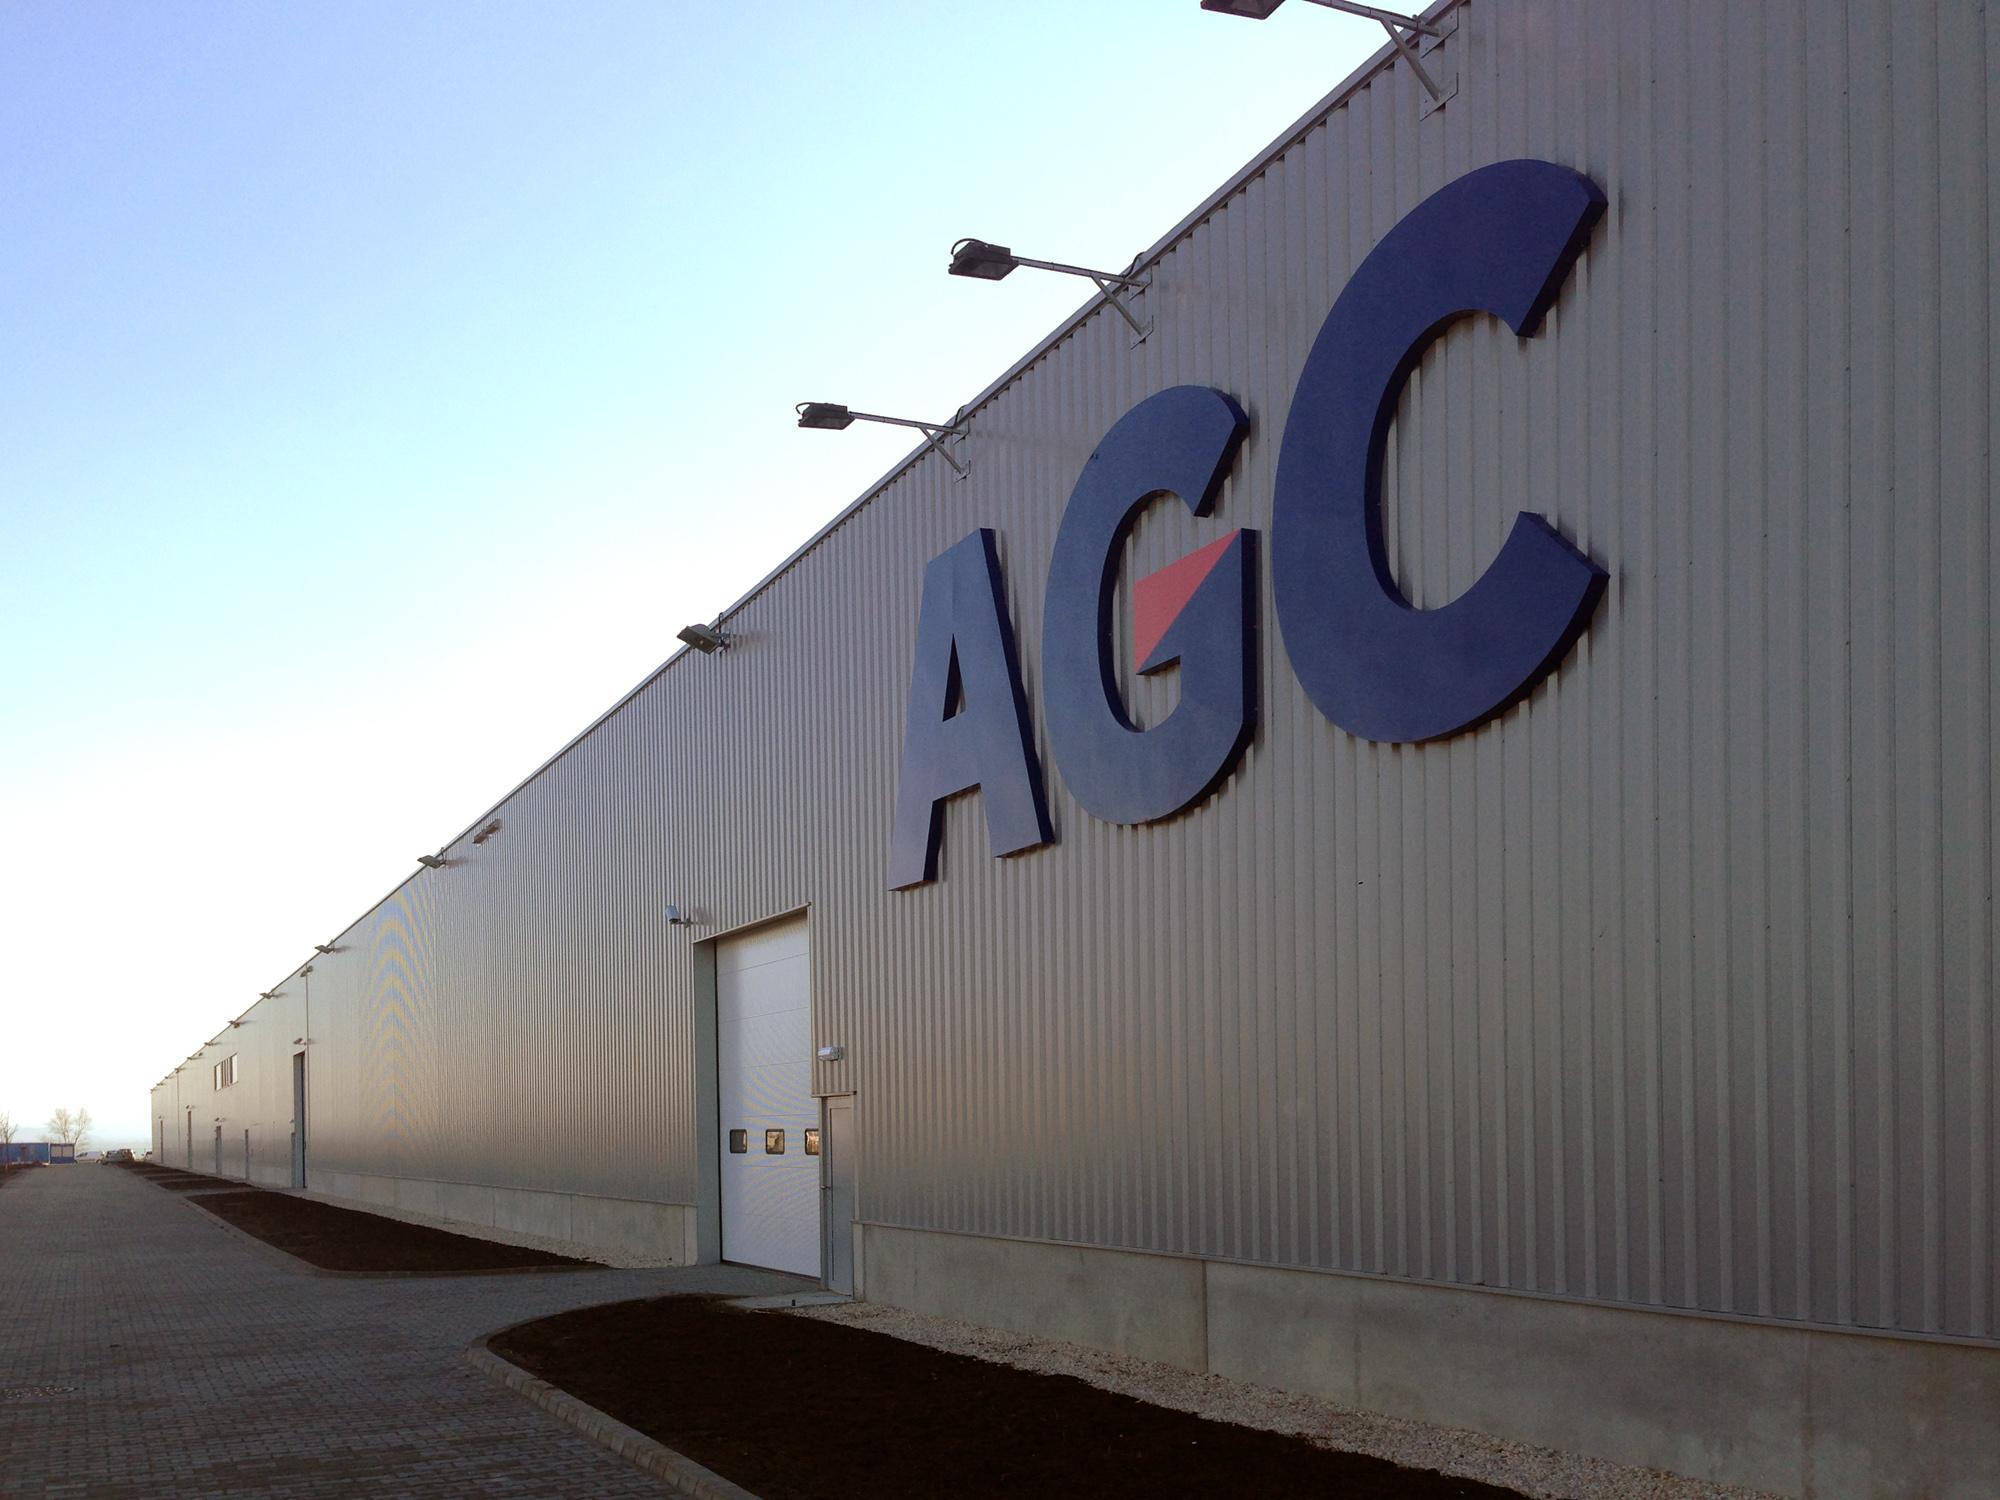 agc-004